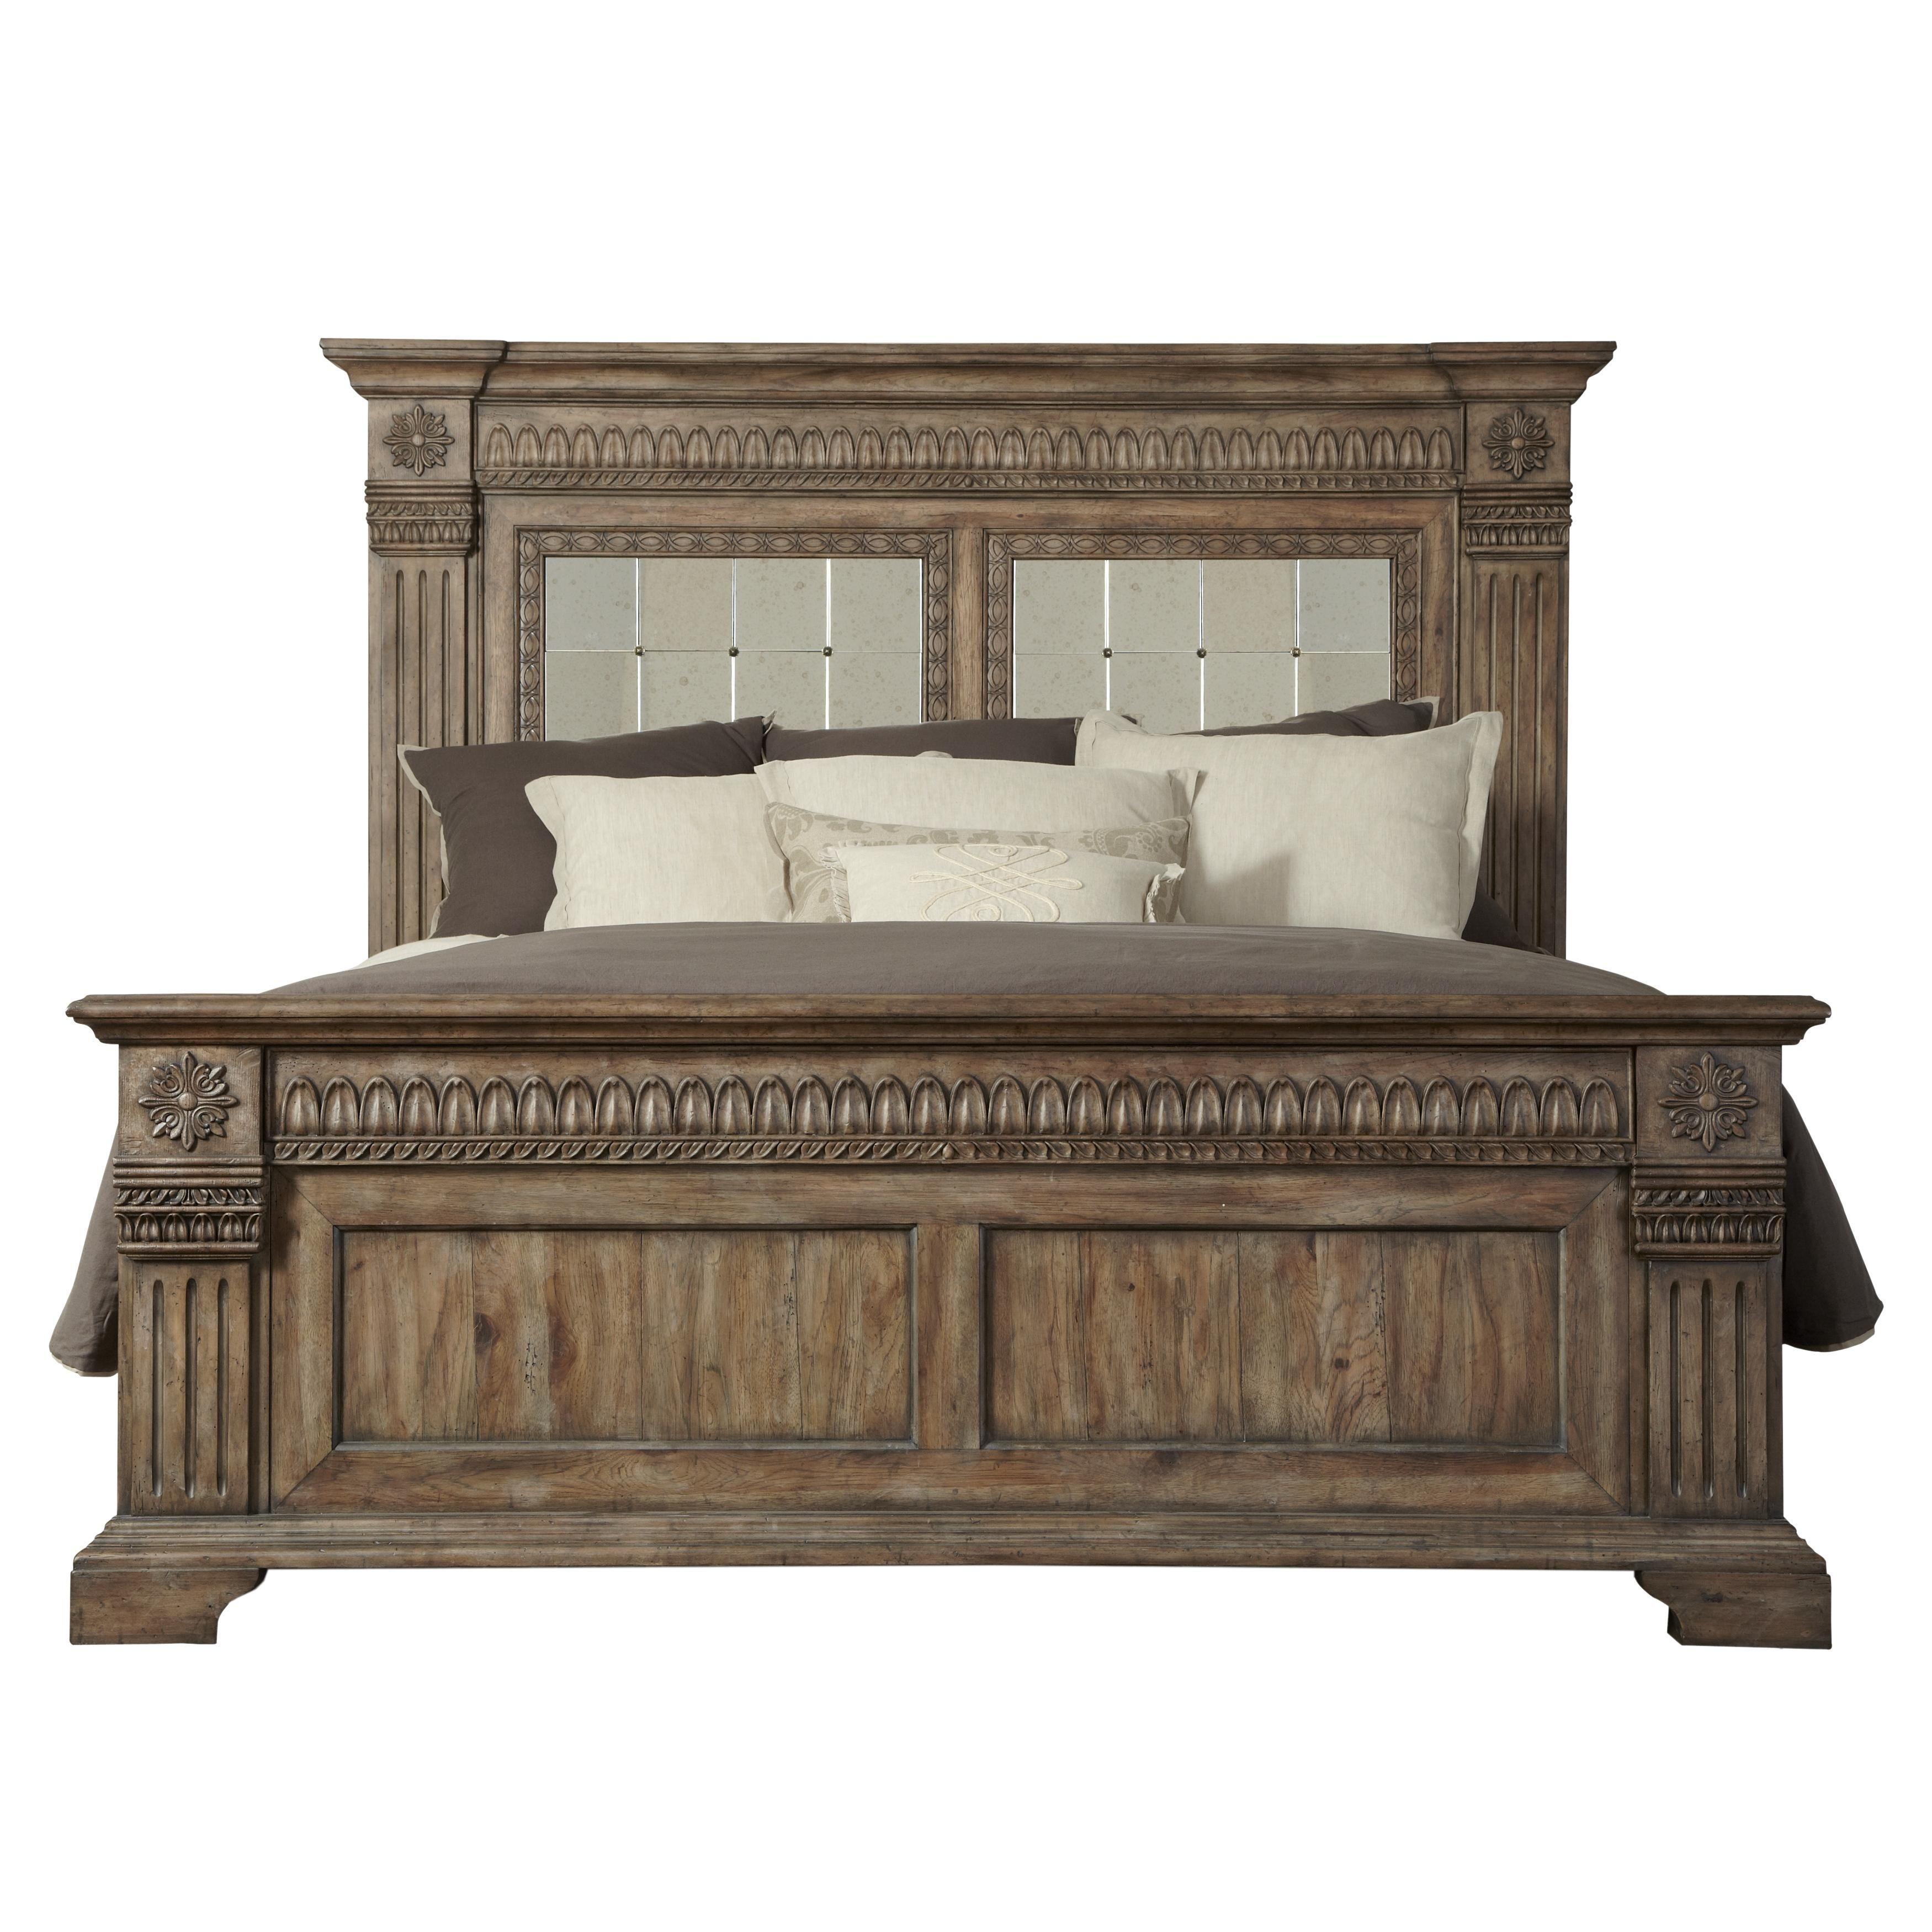 Pulaski Furniture Bedroom Pulaski Furniture Arabella 211 King Panel Bed Ahfa Headboard